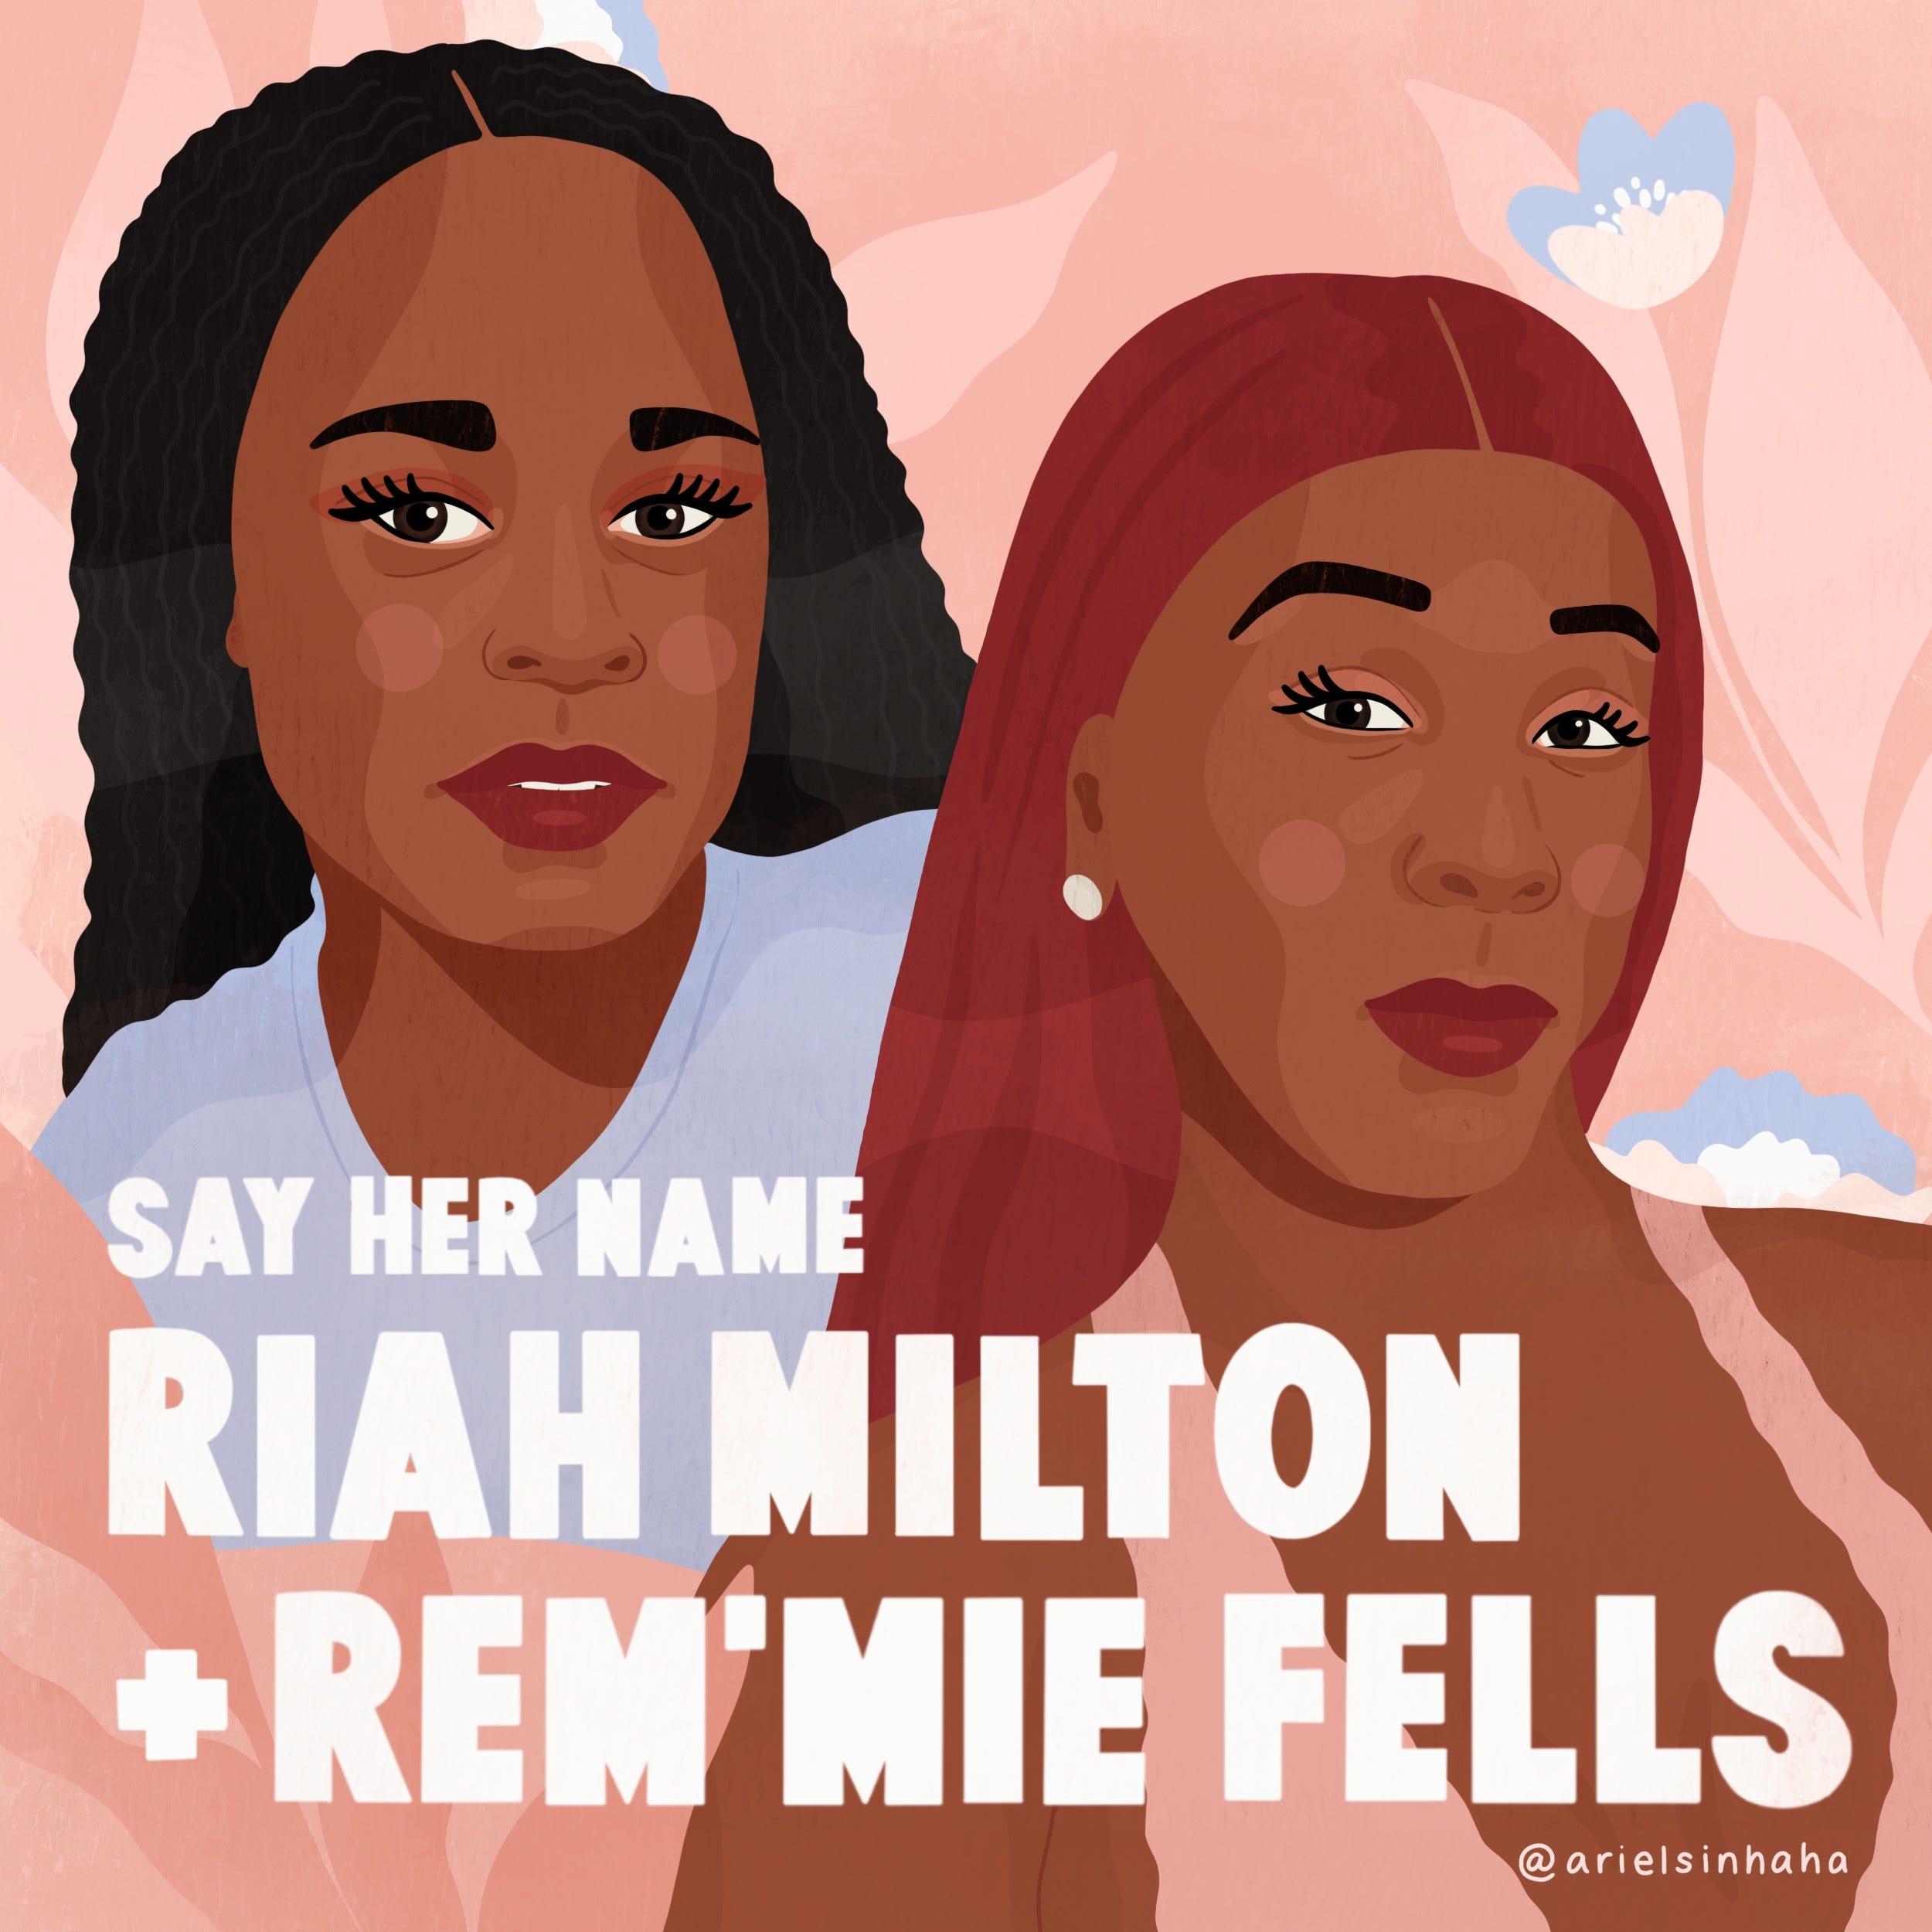 Ariel Sinha drew portraits of Black trans women who were killed, Riah Milton and Rem'mie Fells.